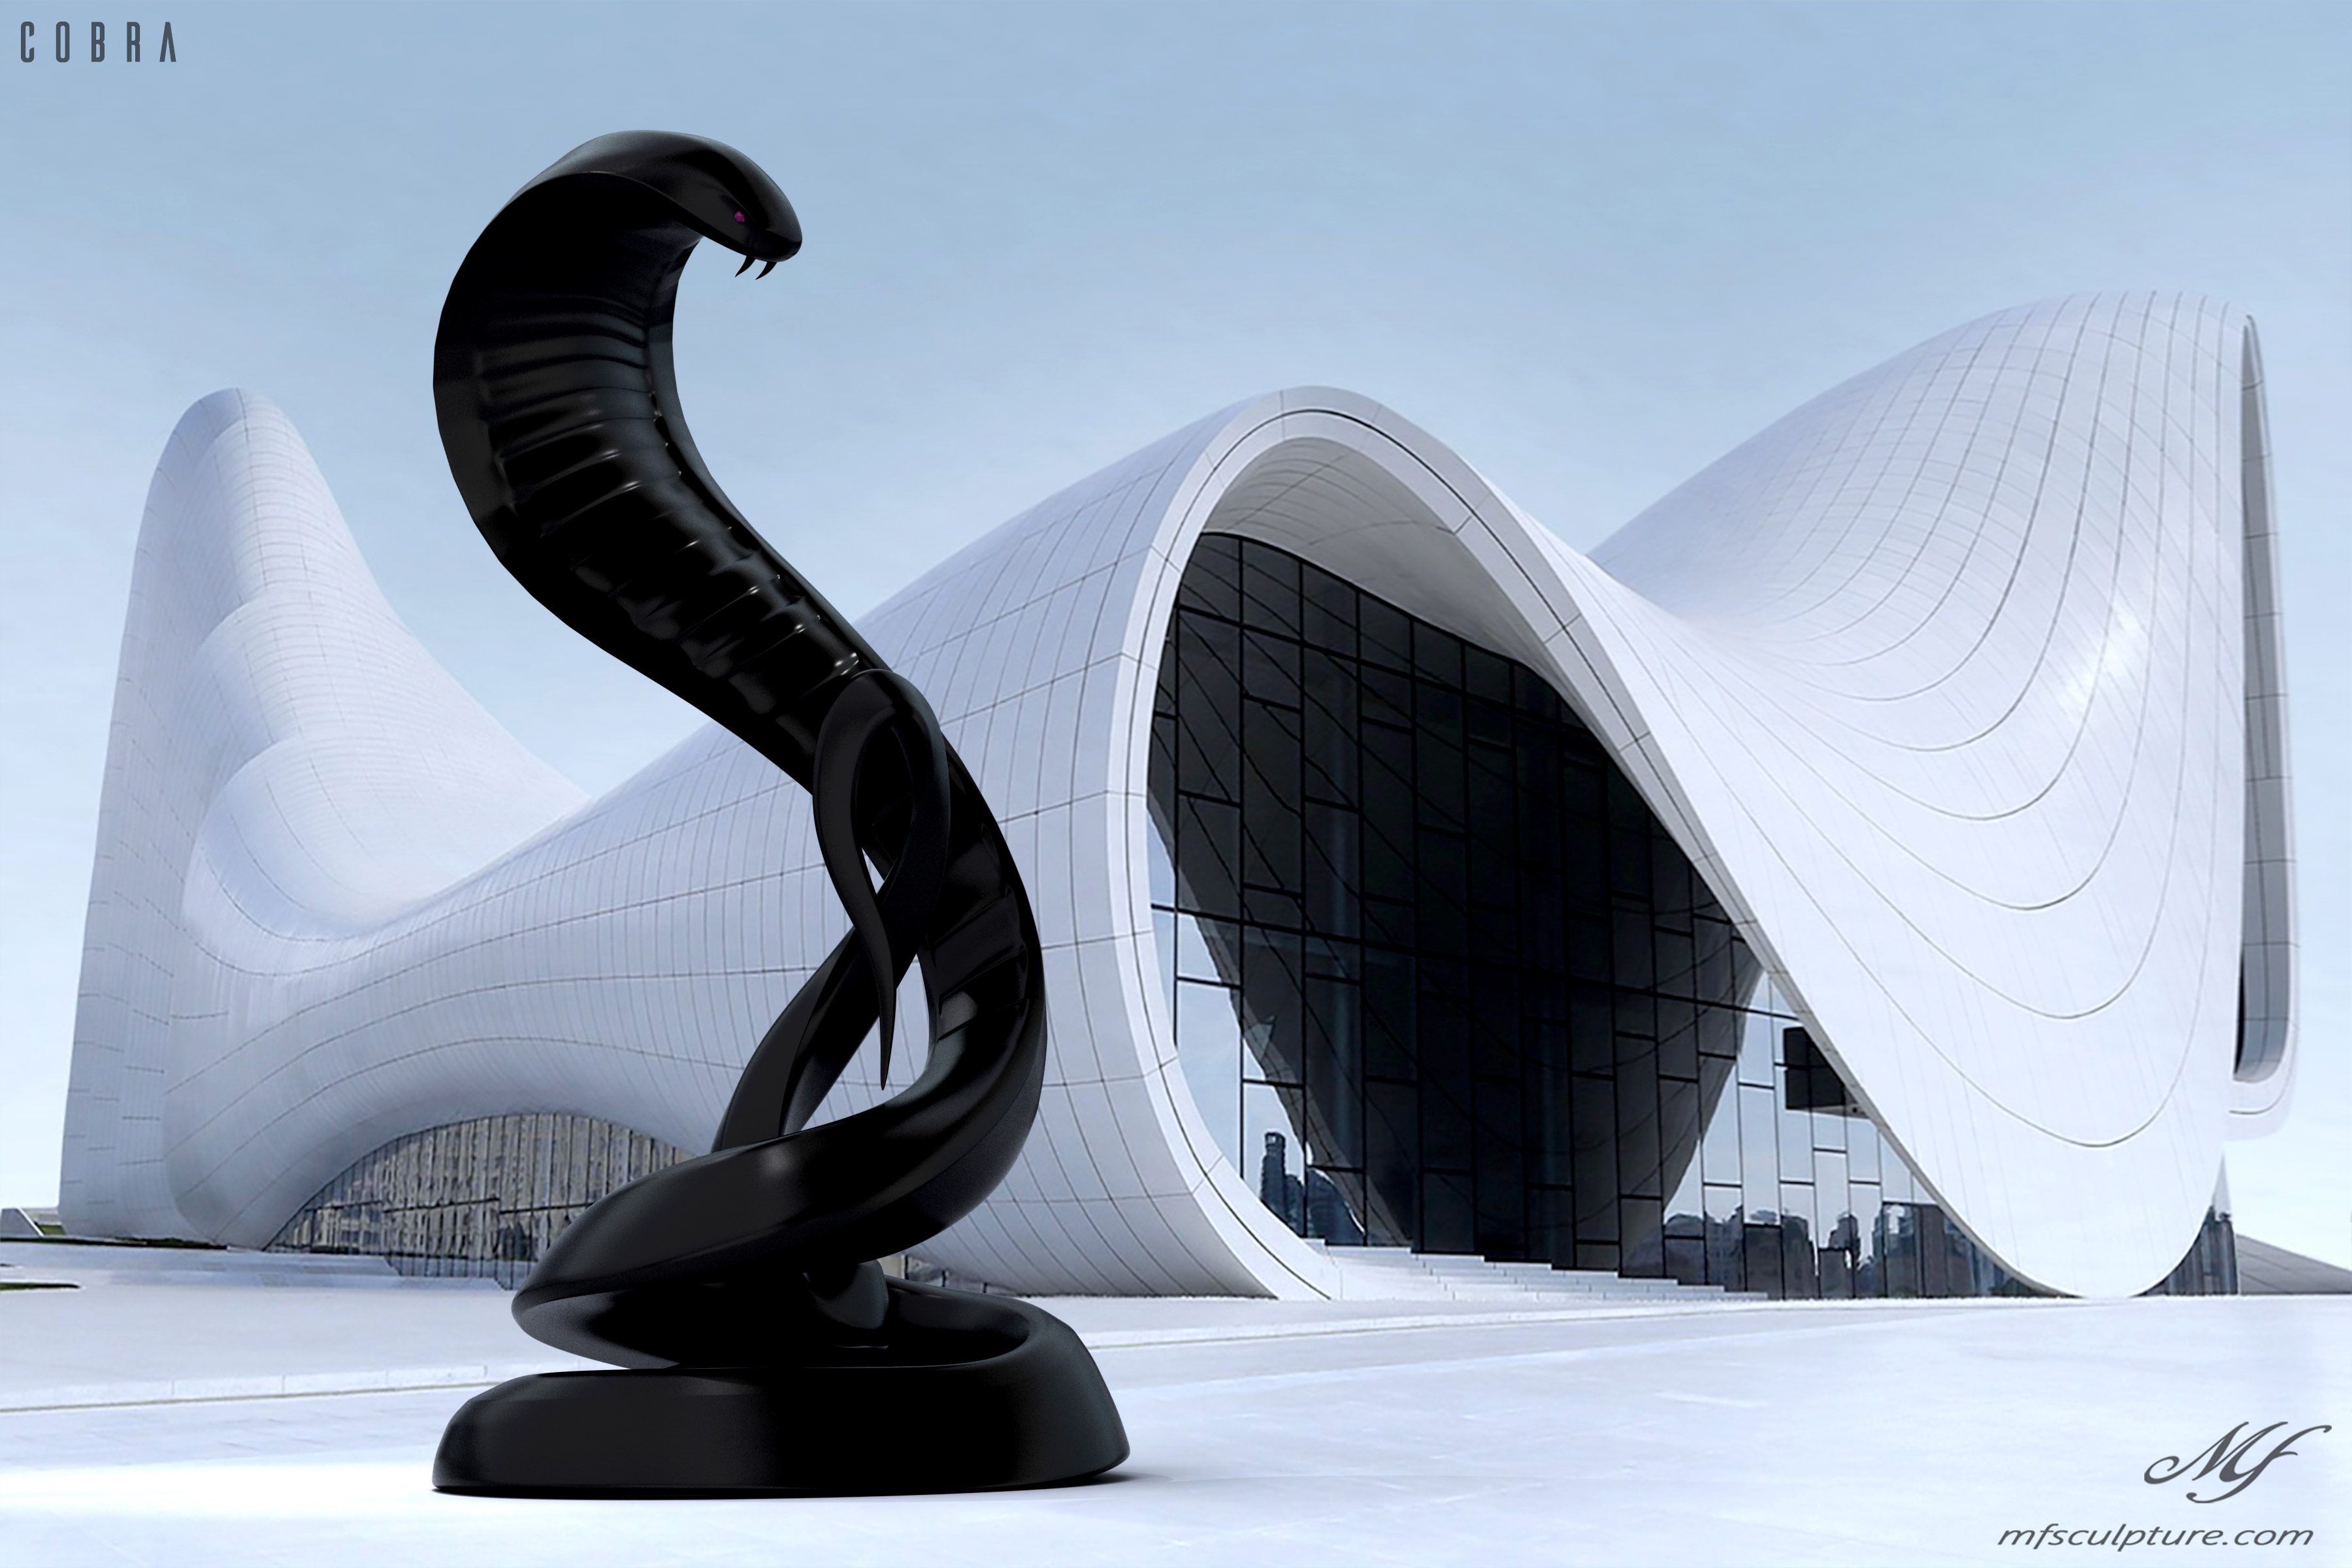 Heydar Aliyev Zaha Hadid Modern Sculpture Cobra2 3